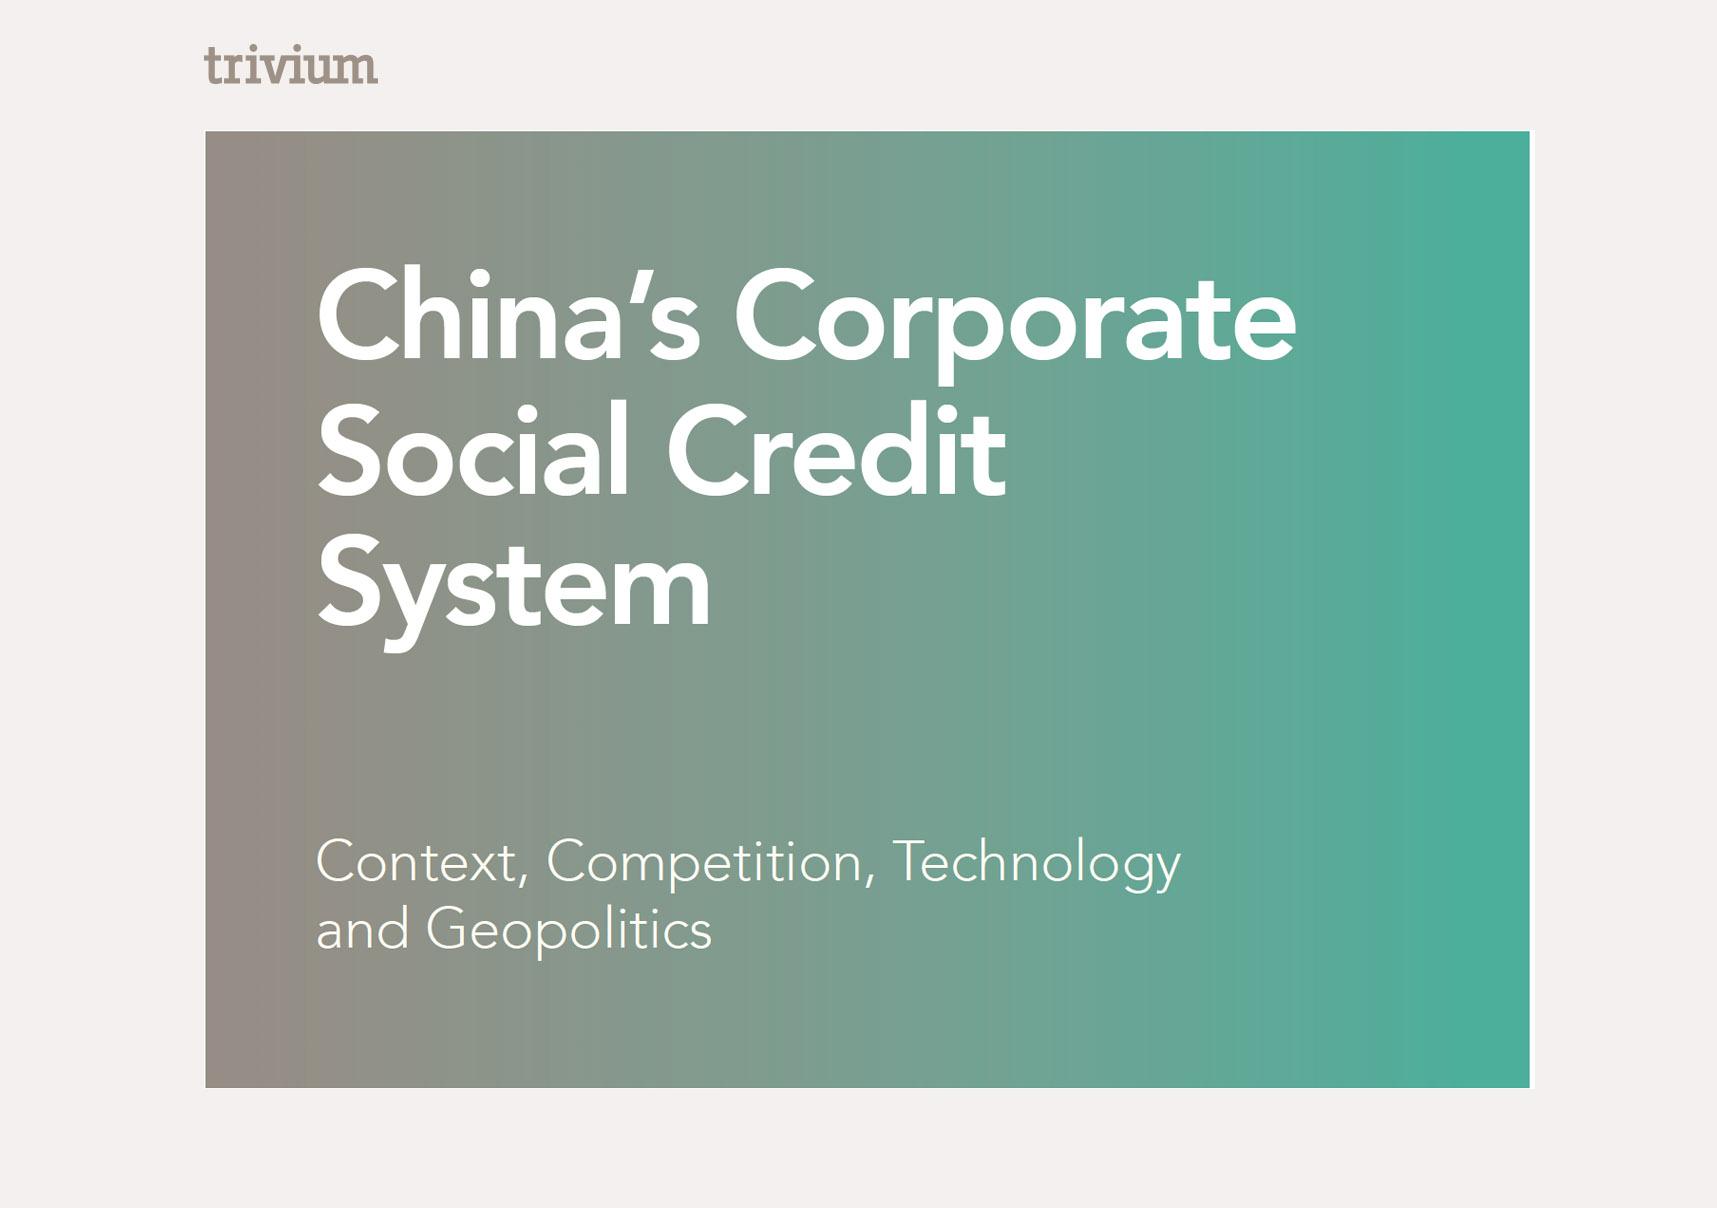 China's Corporate Social Credit System Trivium Report